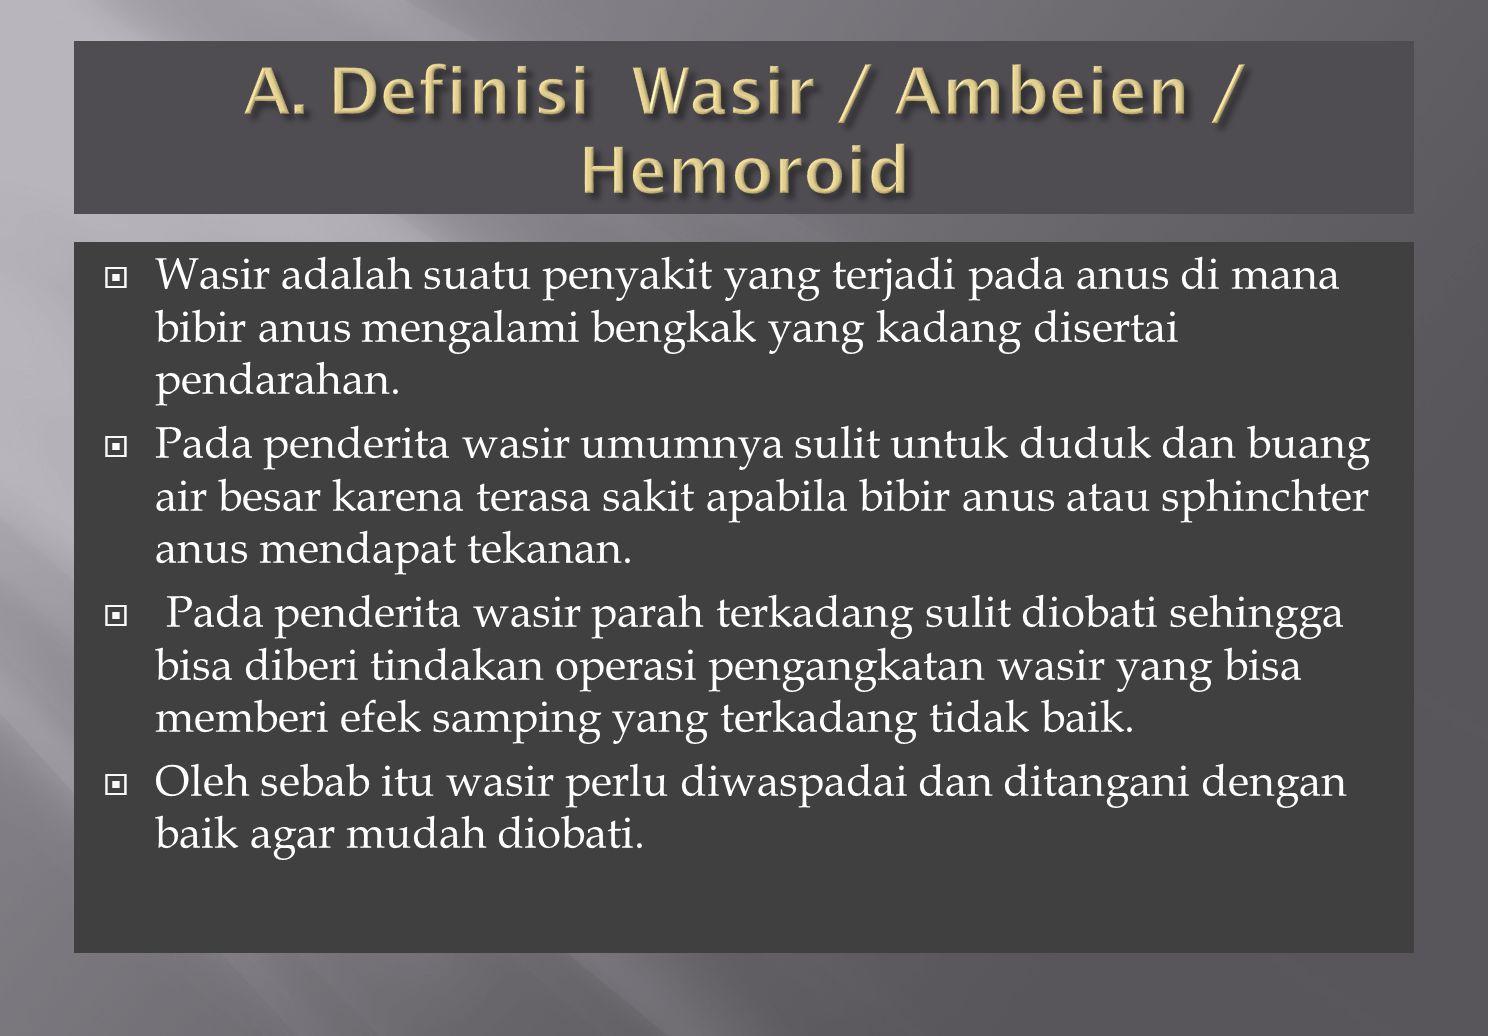 A. Definisi Wasir / Ambeien / Hemoroid